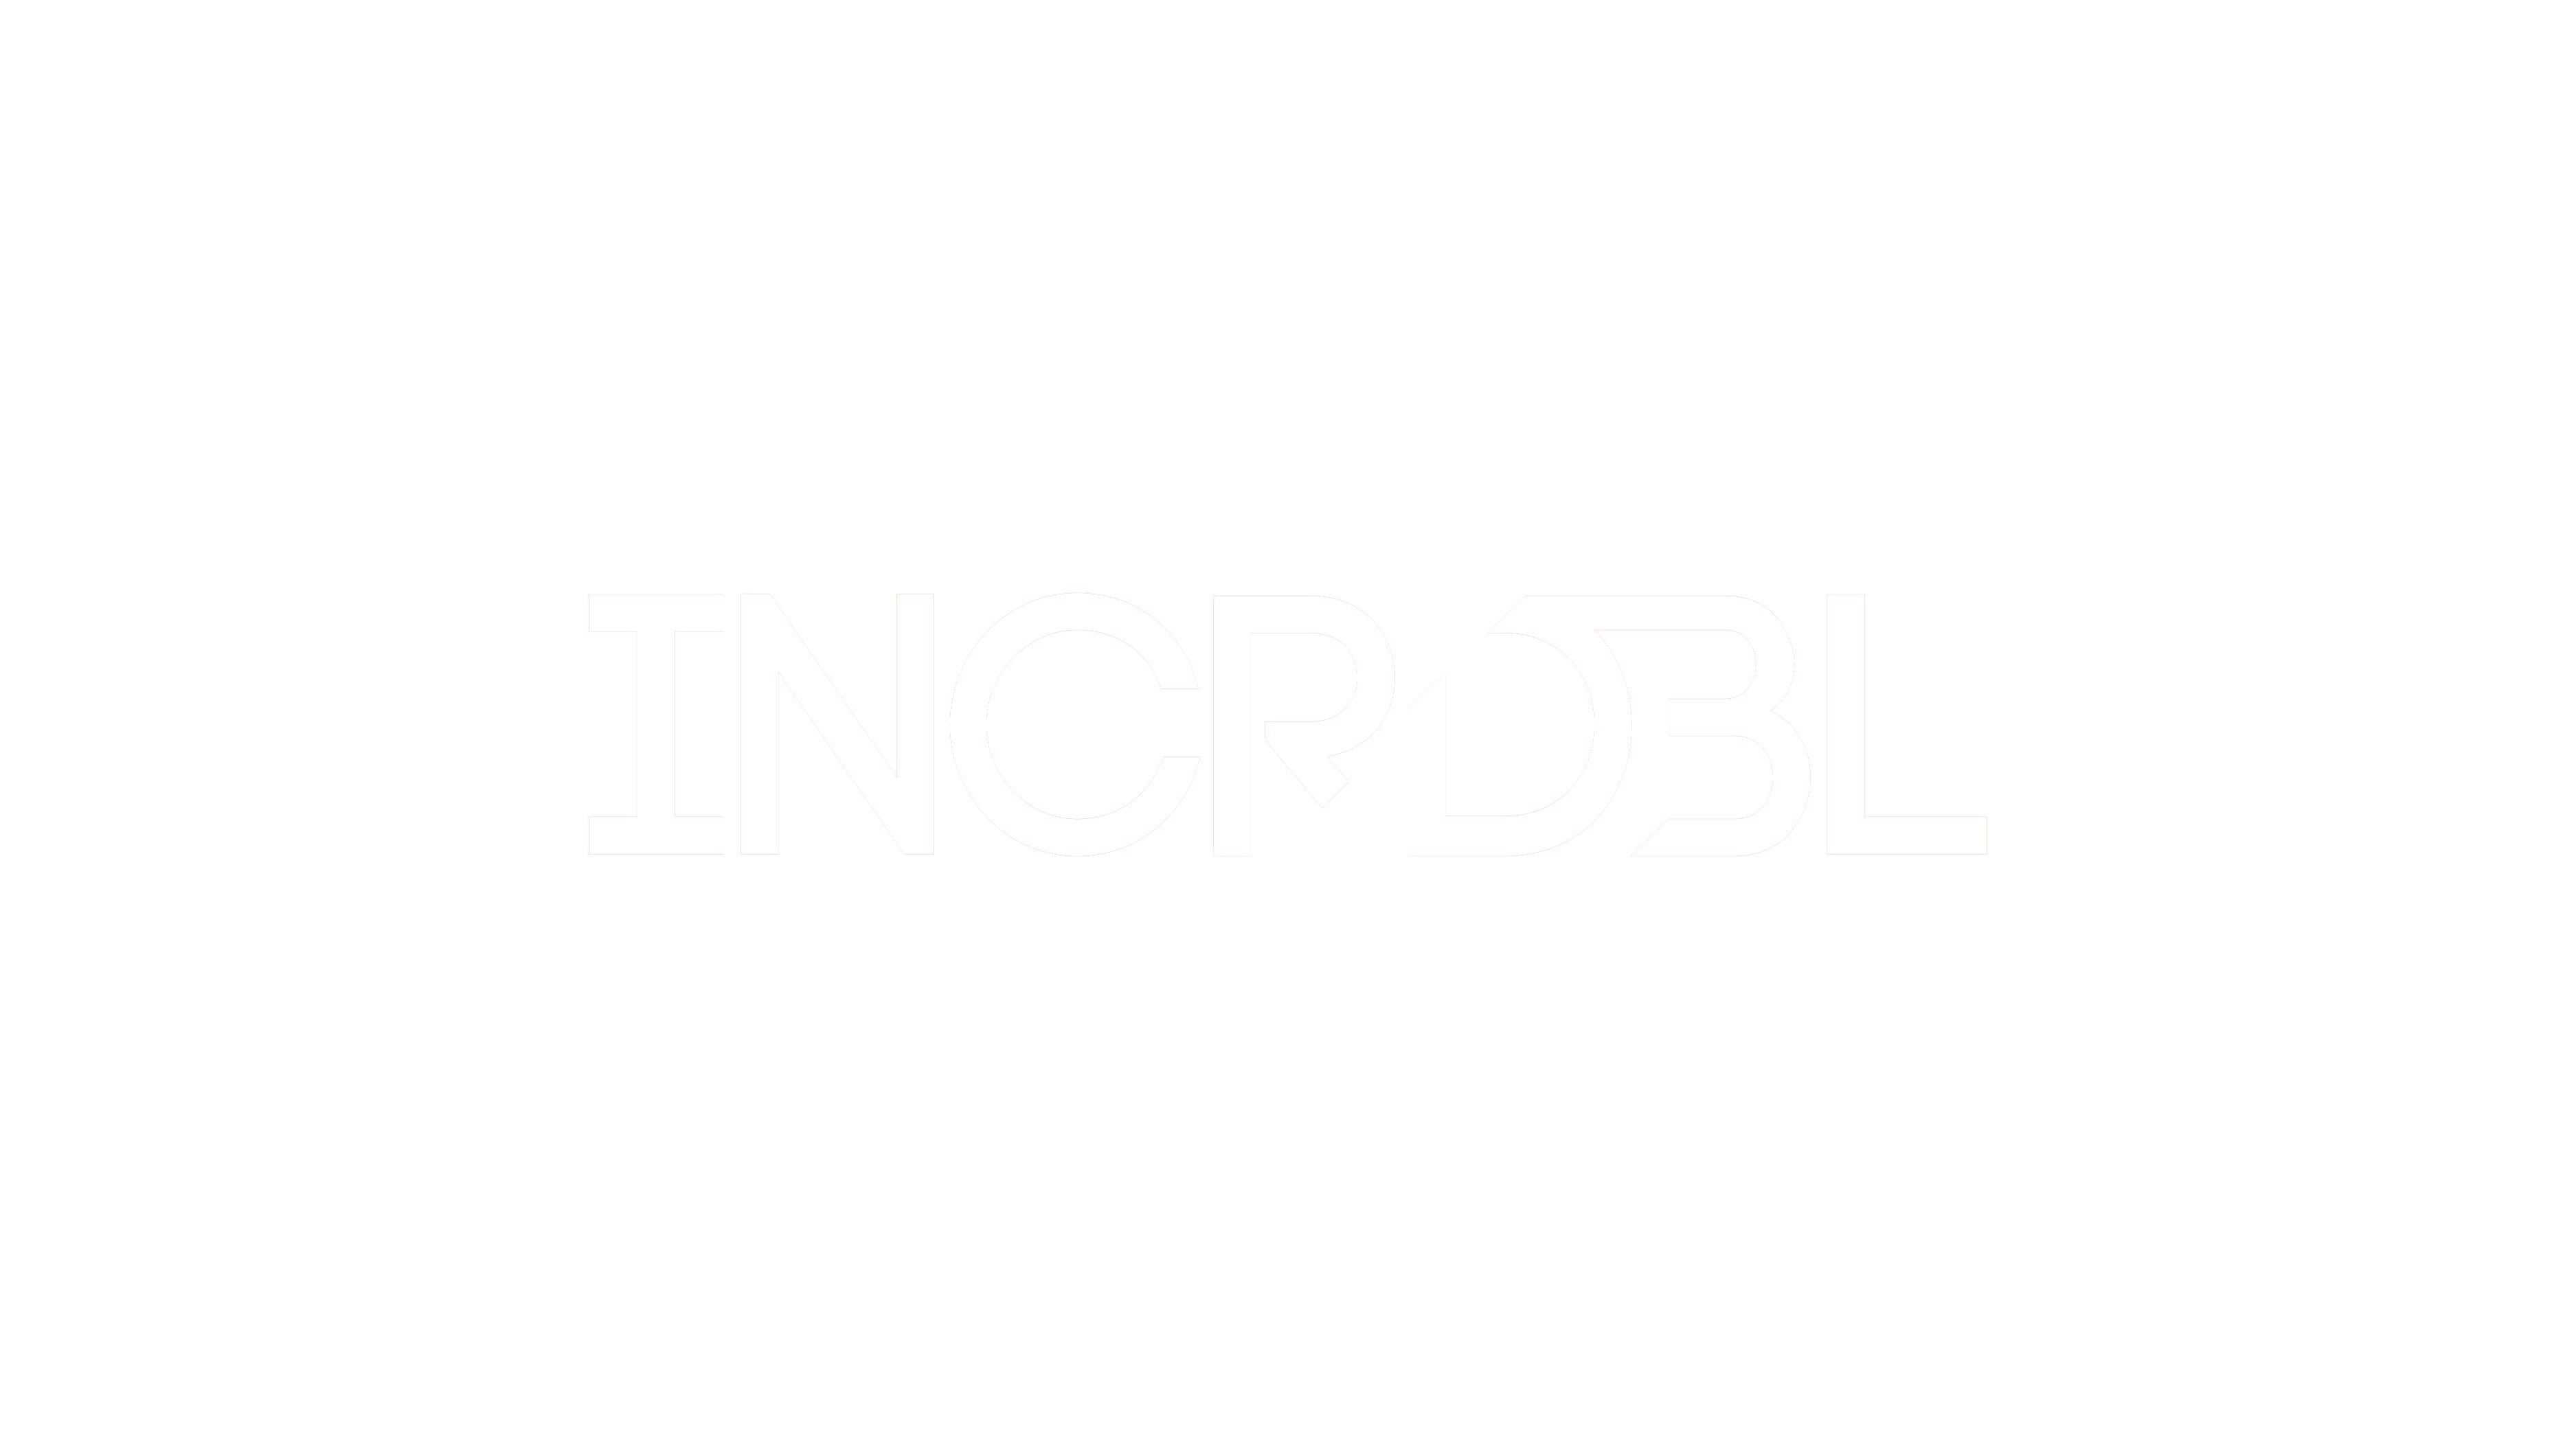 INCRDBL_Logo_onBG_transp_white